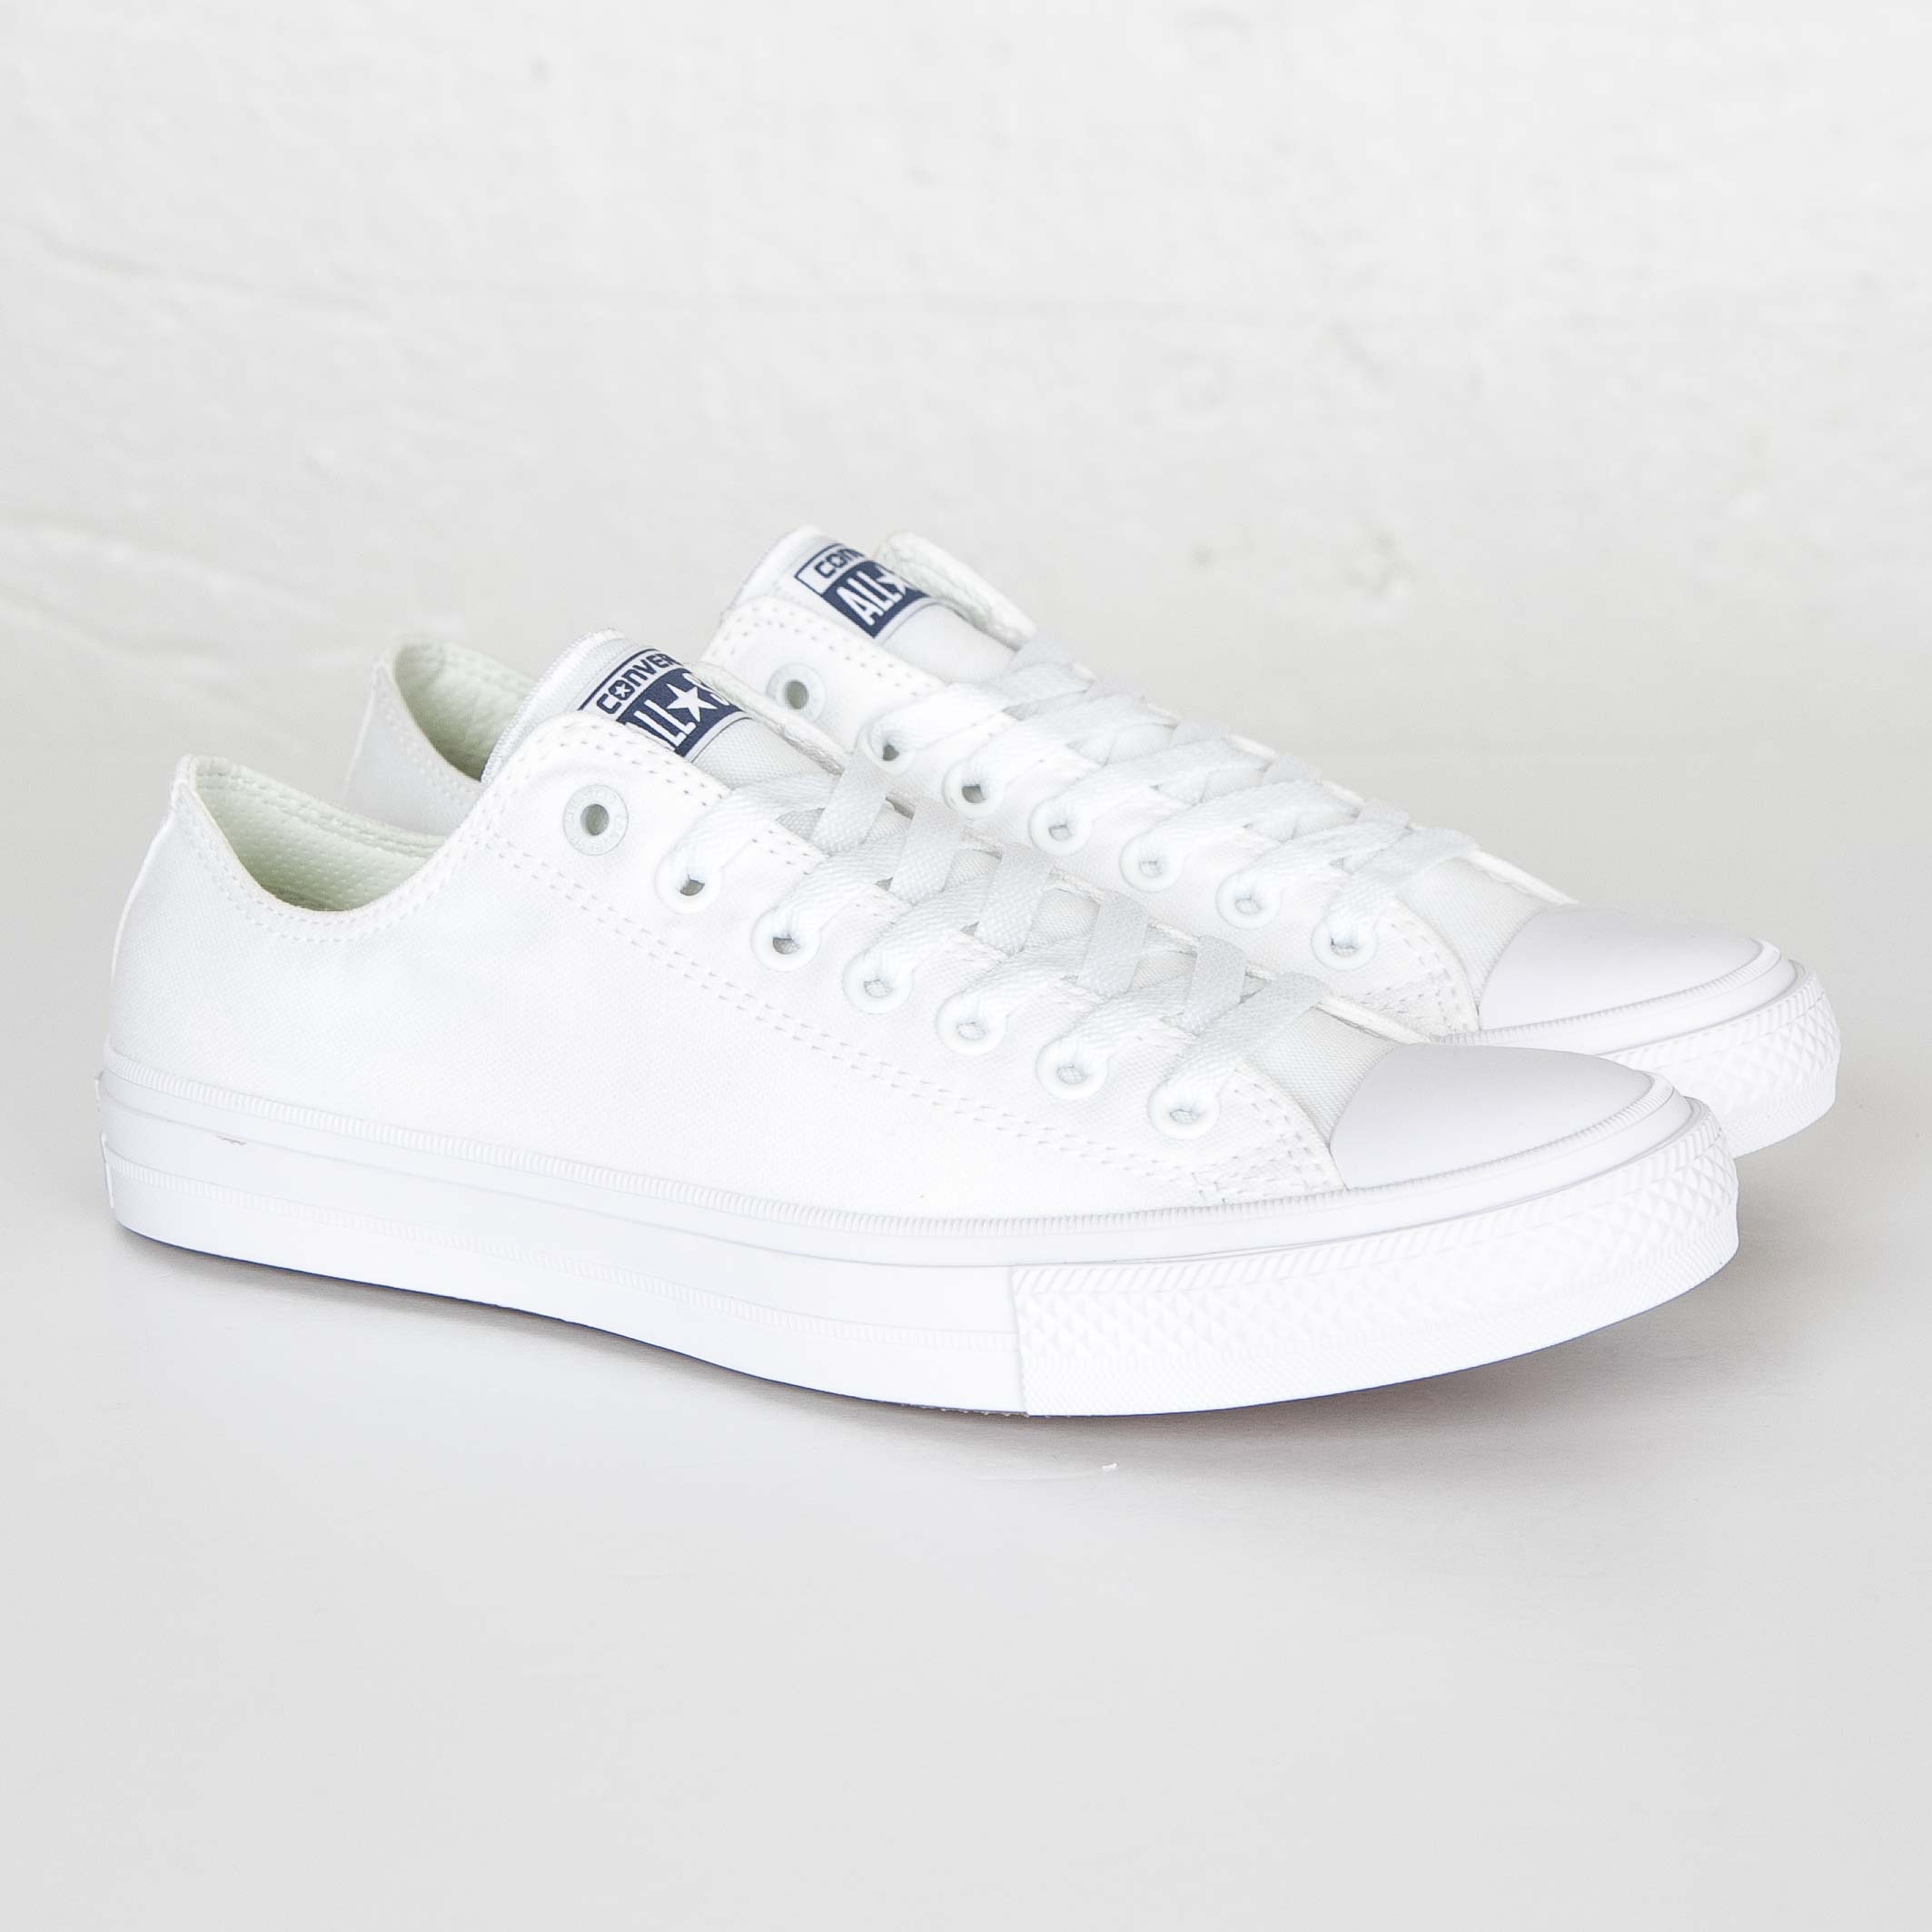 a2456ac00a9 Converse Chuck Taylor II Ox - 150154c - Sneakersnstuff